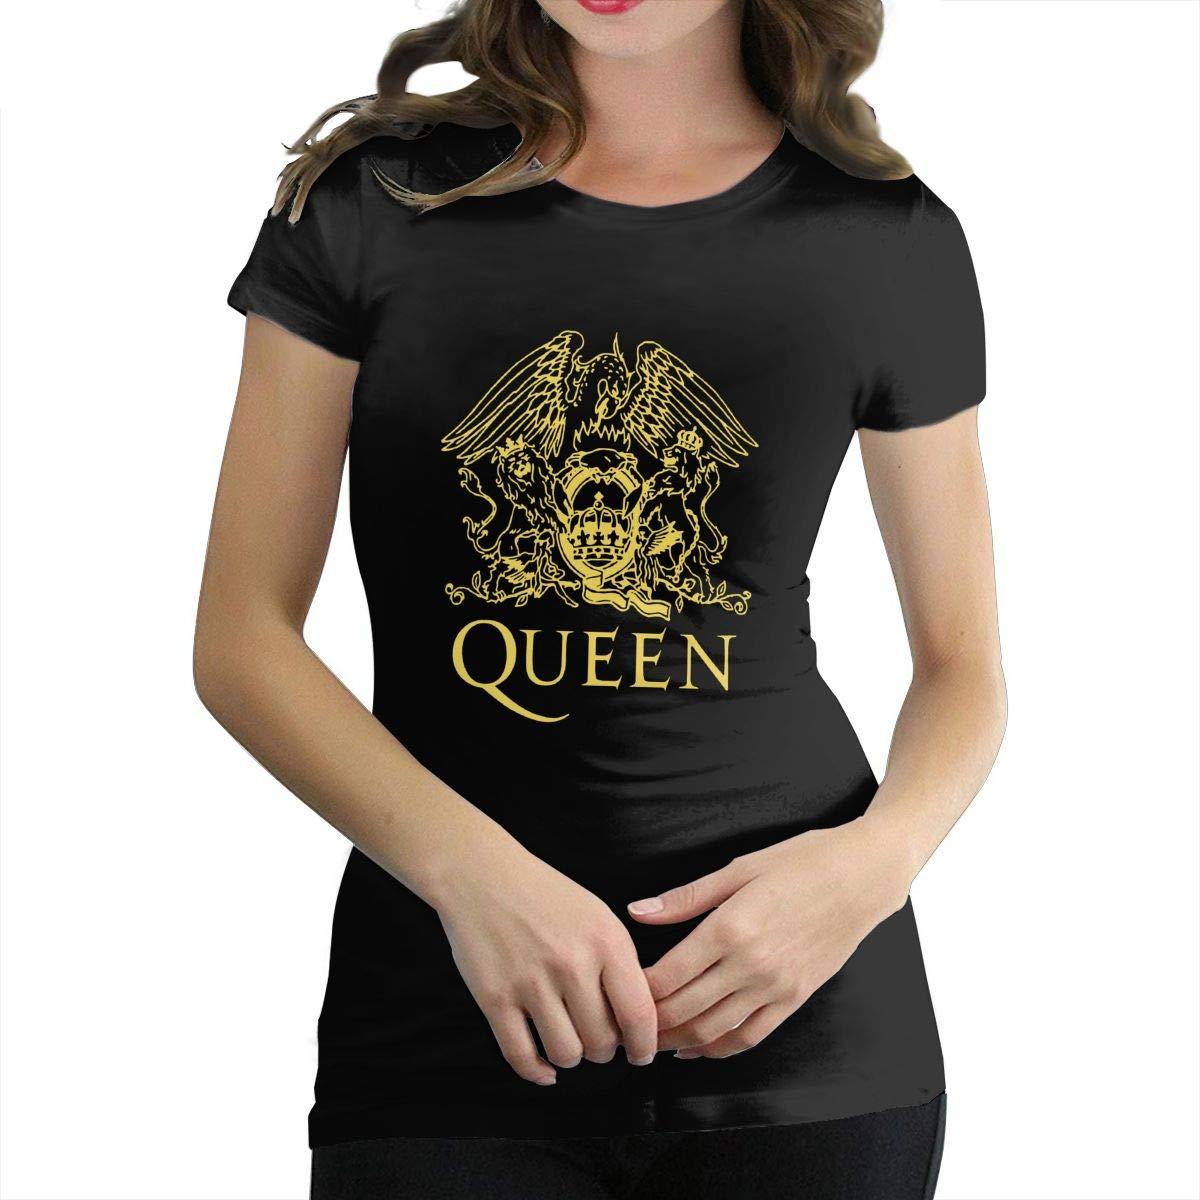 Ocilgc Shirt Round Neck Short Sleeve T Shirt For 3338